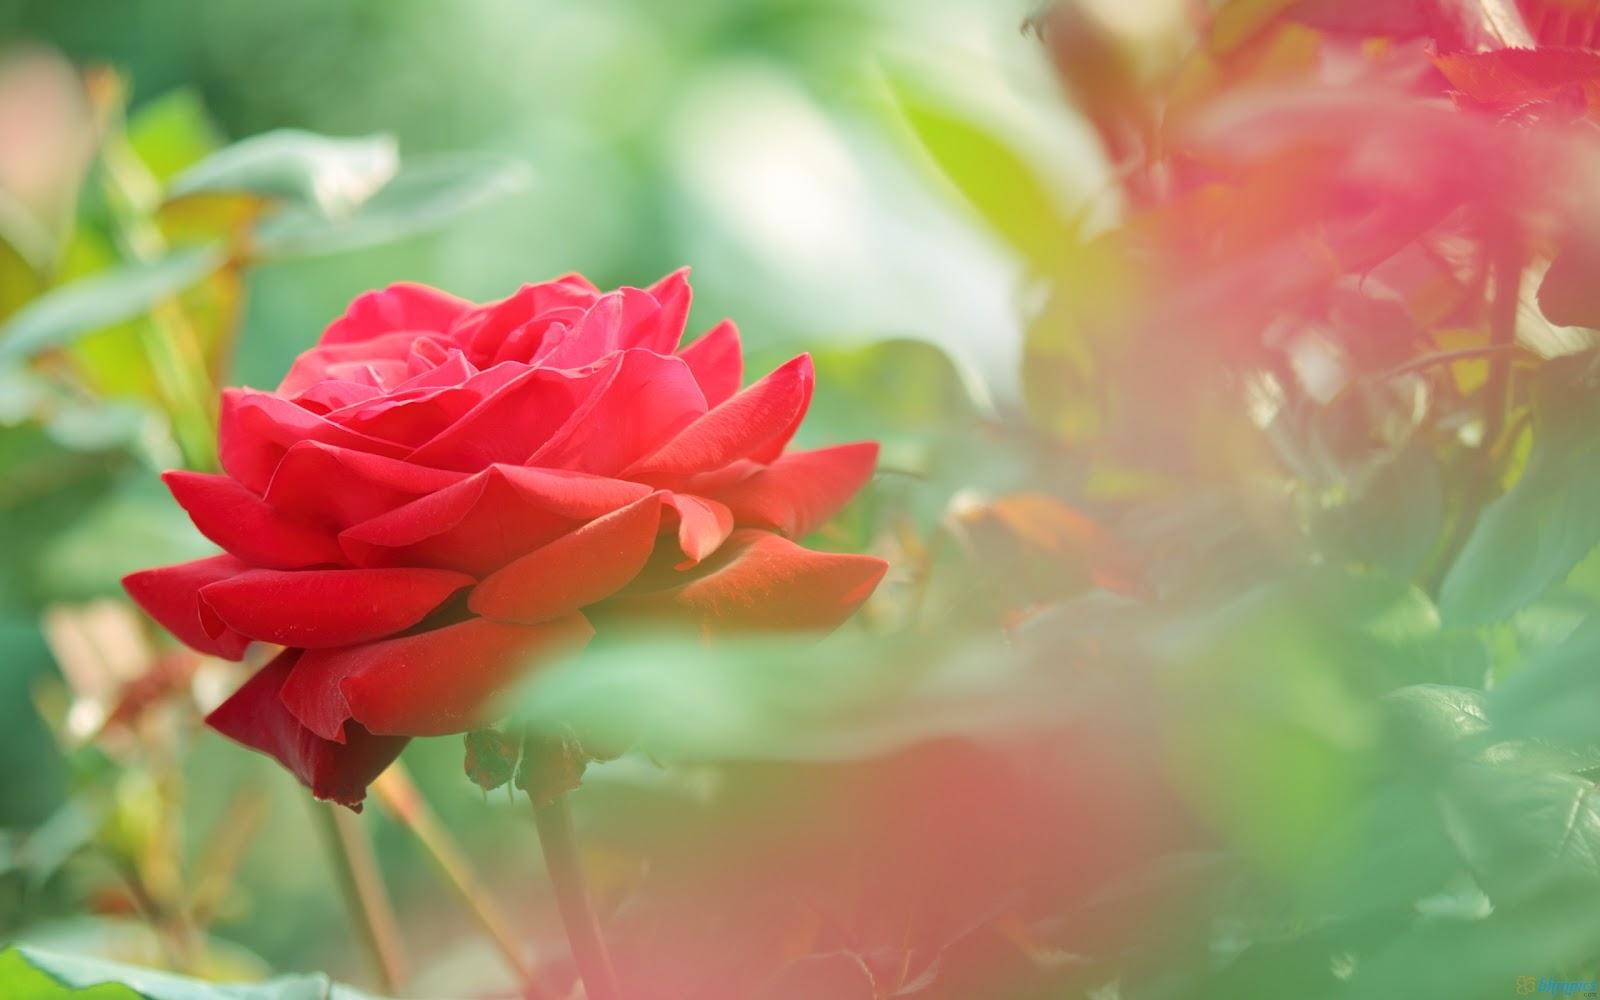 http://1.bp.blogspot.com/-TjEy3bzfDjo/UD8ZKITI6lI/AAAAAAAADCs/3ZVOKKAY9yw/s1600/red_petals_buds_rose-2560x1600.jpg%20